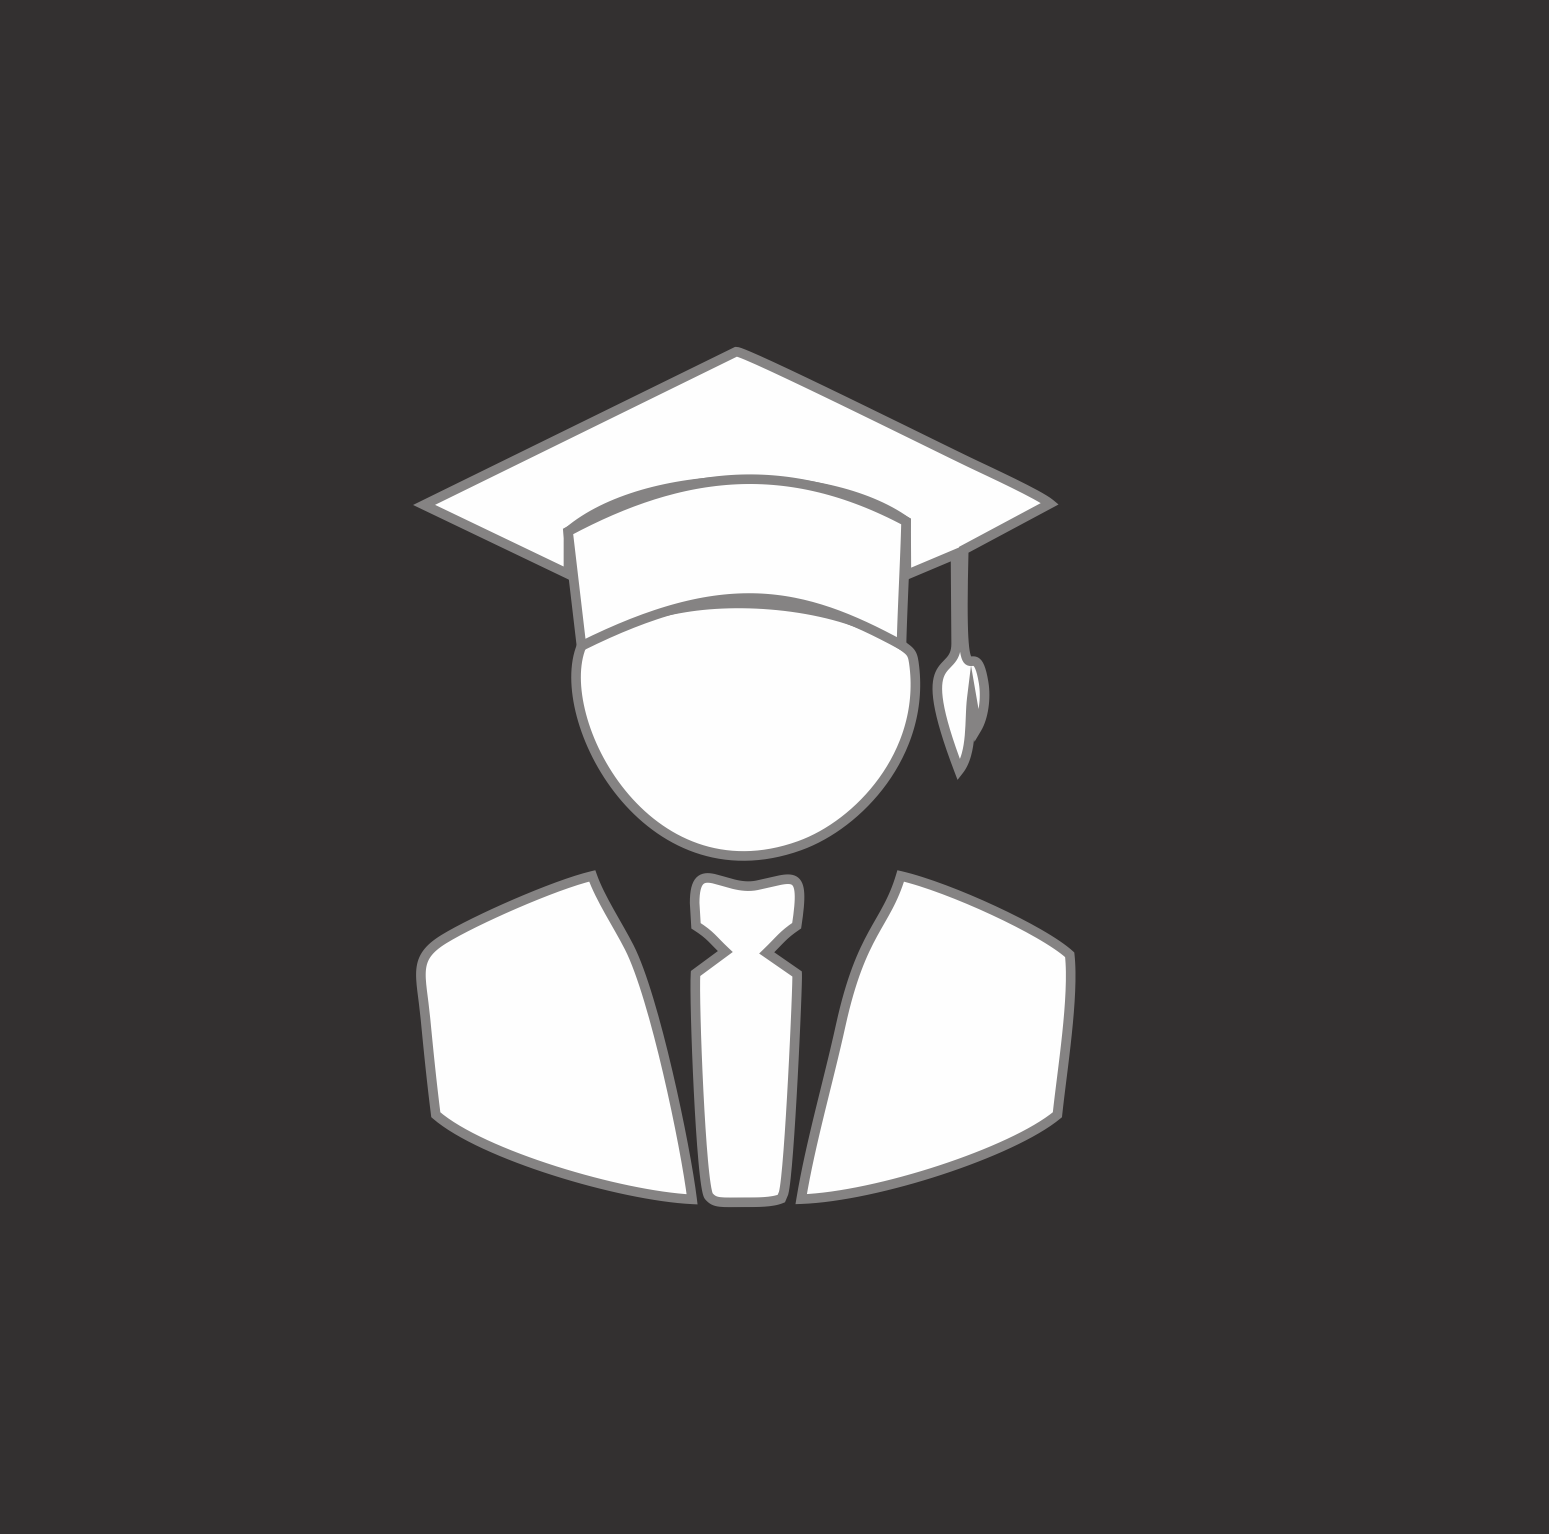 stock-vector-international-education-flat-design-illustrator-295666004.jpg